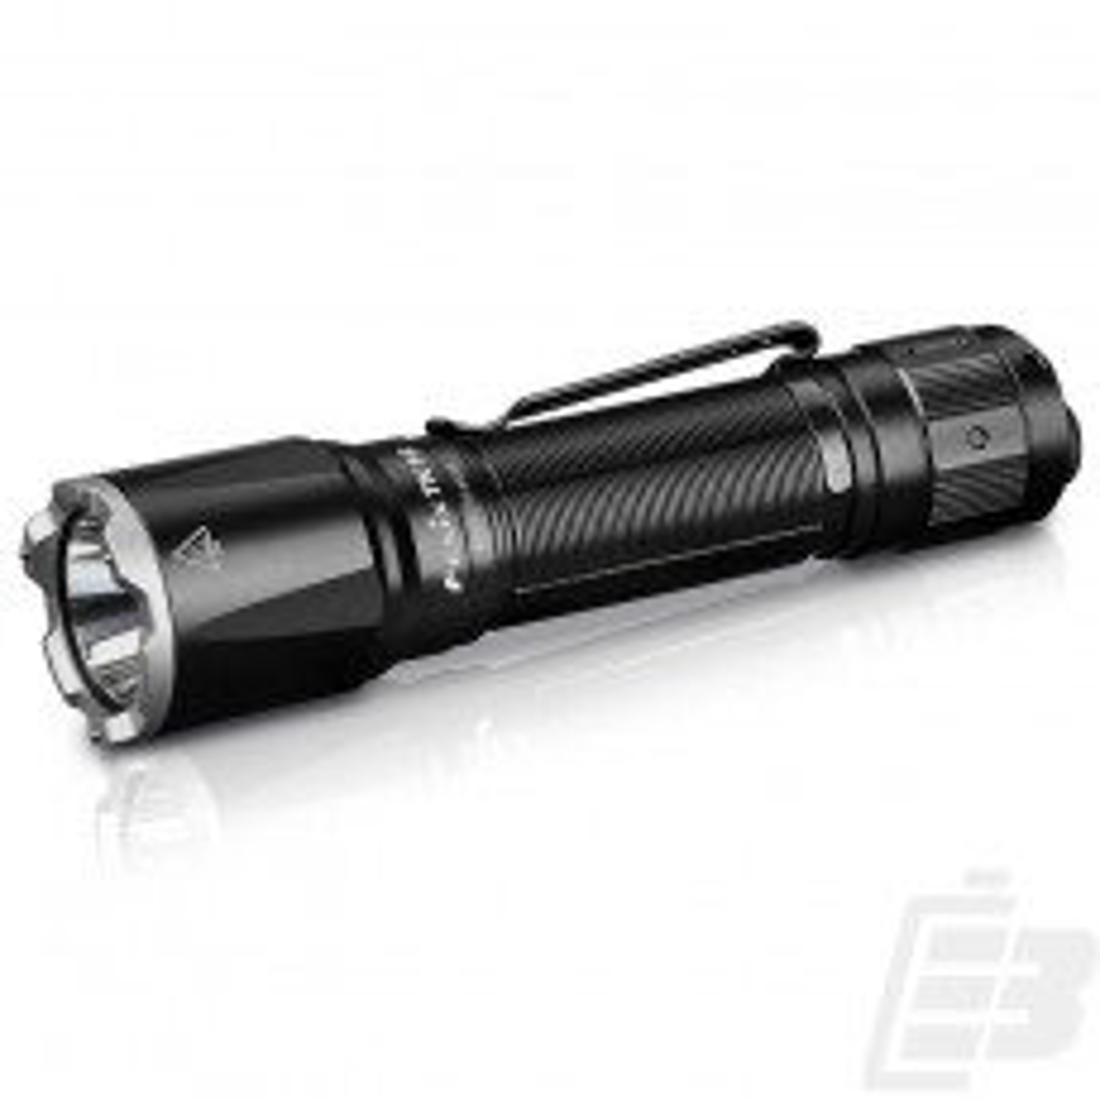 Fenix TK16 V2.0 Tactical Flashlight